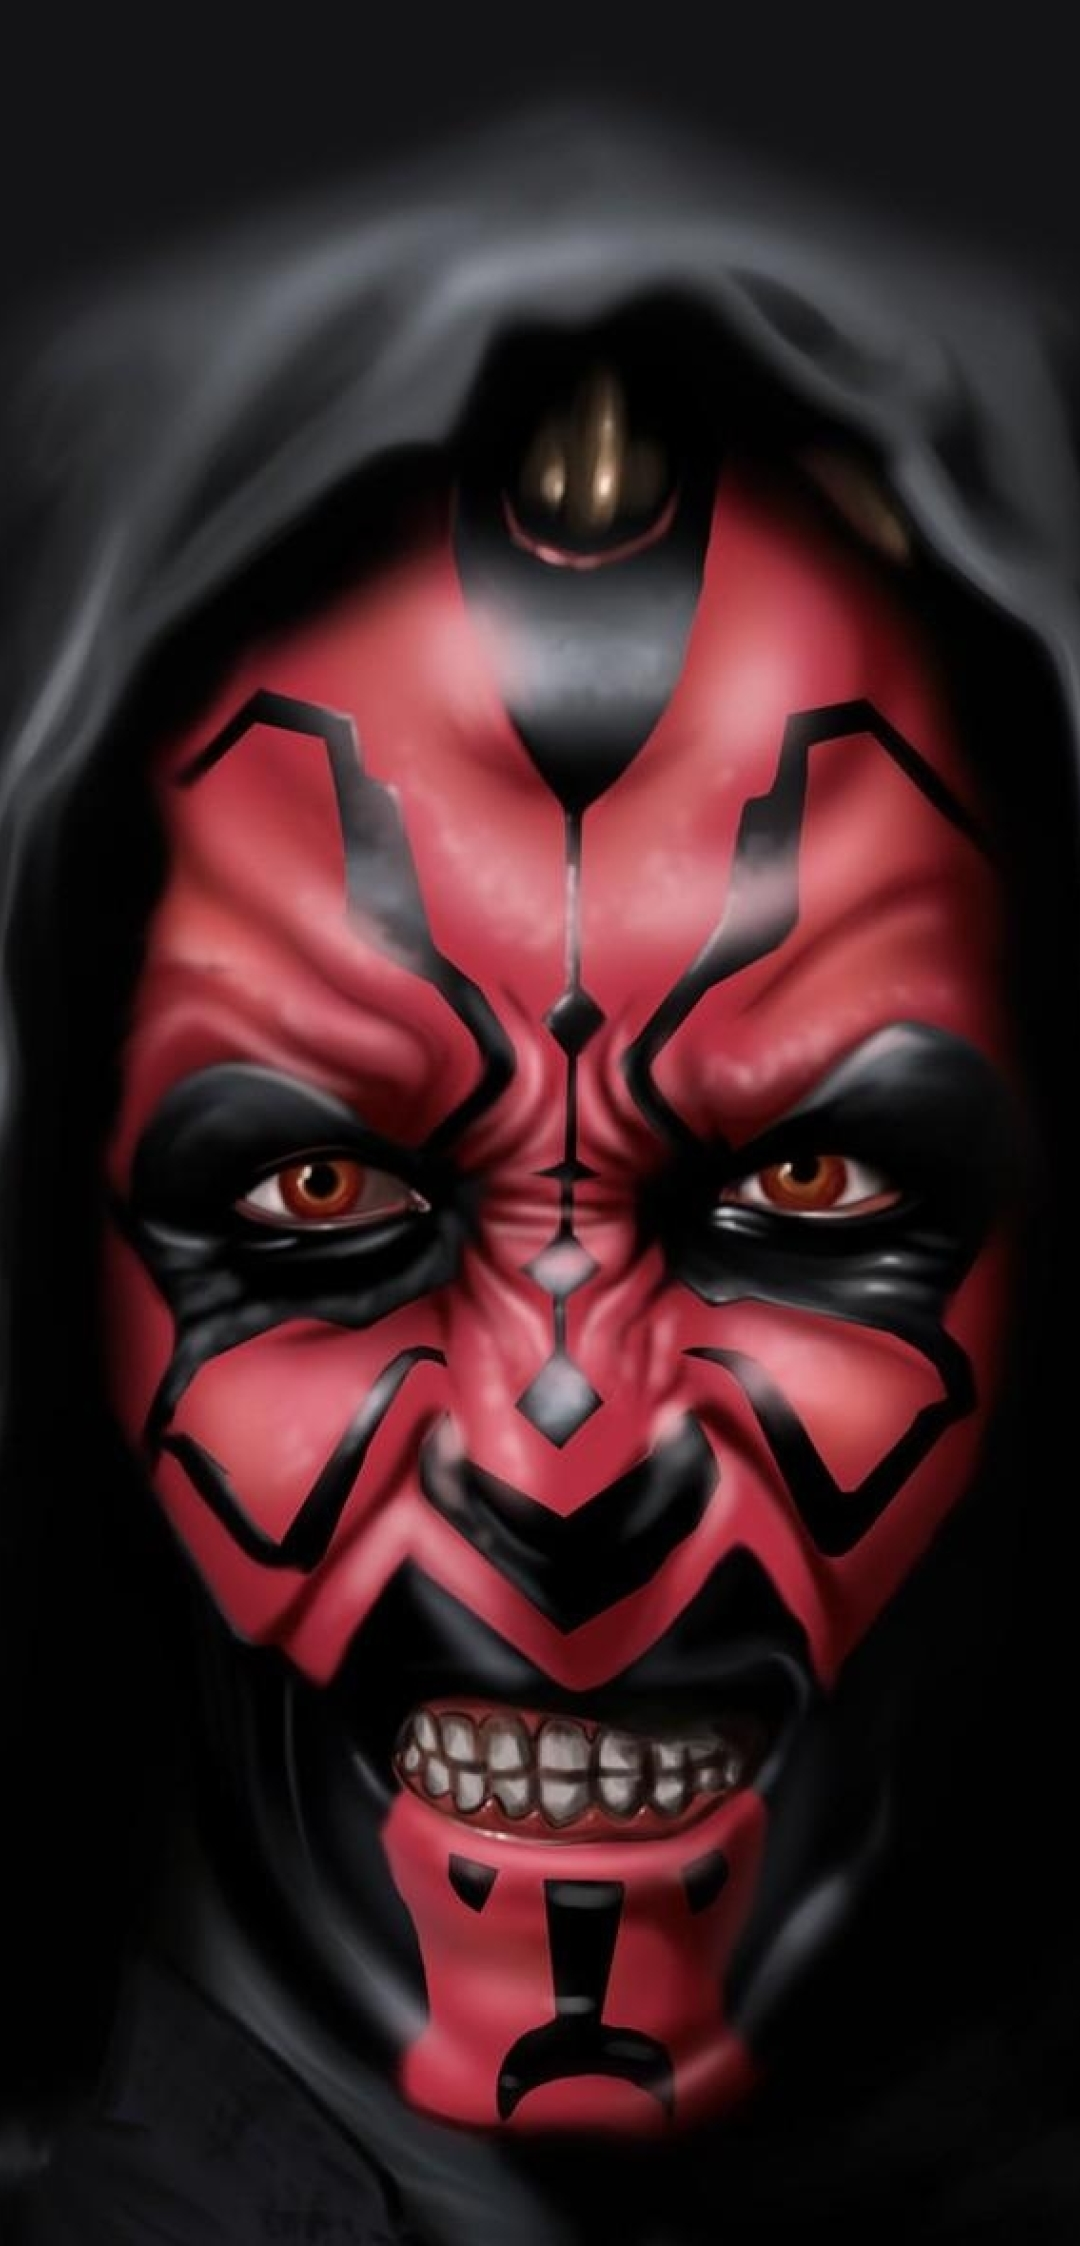 1080x2246 Sith Star Wars Darth Maul 1080x2246 Resolution